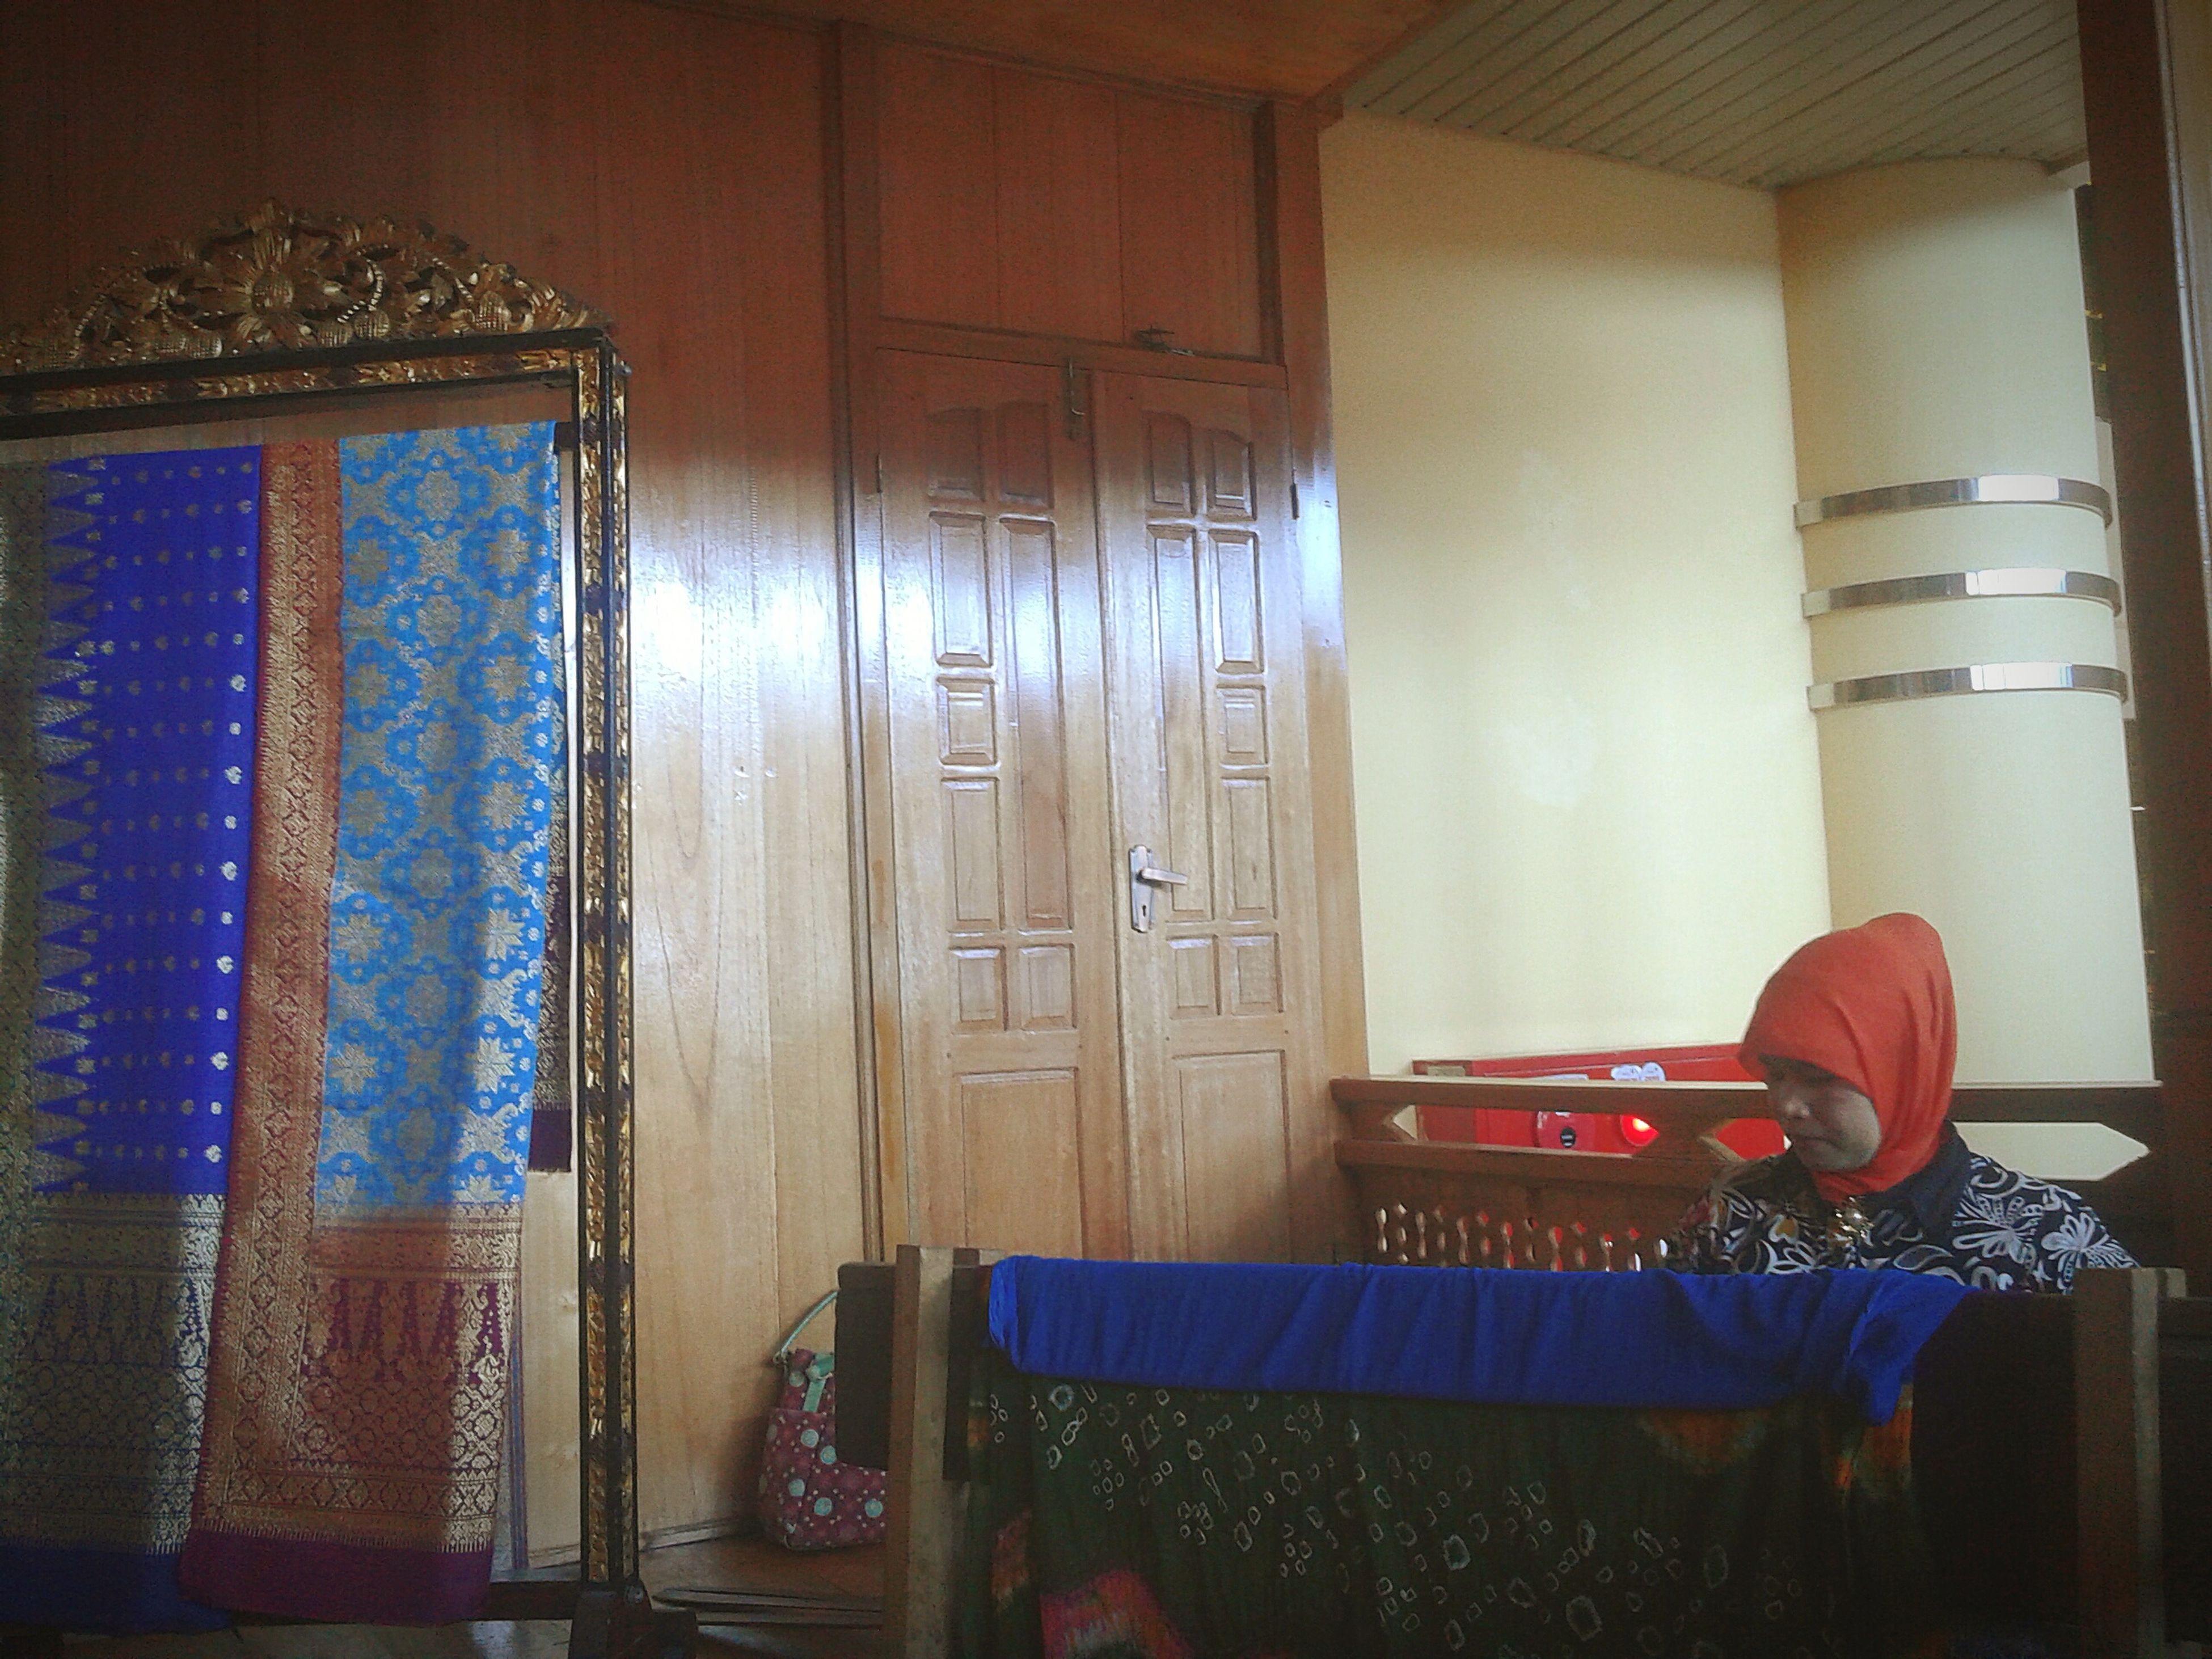 Tenun Songket Traditional Clothing Tenun Traditional Culture Traditional Fabric Sumatera Island Heritage Matters Songket Palembang Beautiful_indonesia Travelling Travel Destinations South Of Sumatra Sumateraselatan Tradition Visit Indonesia